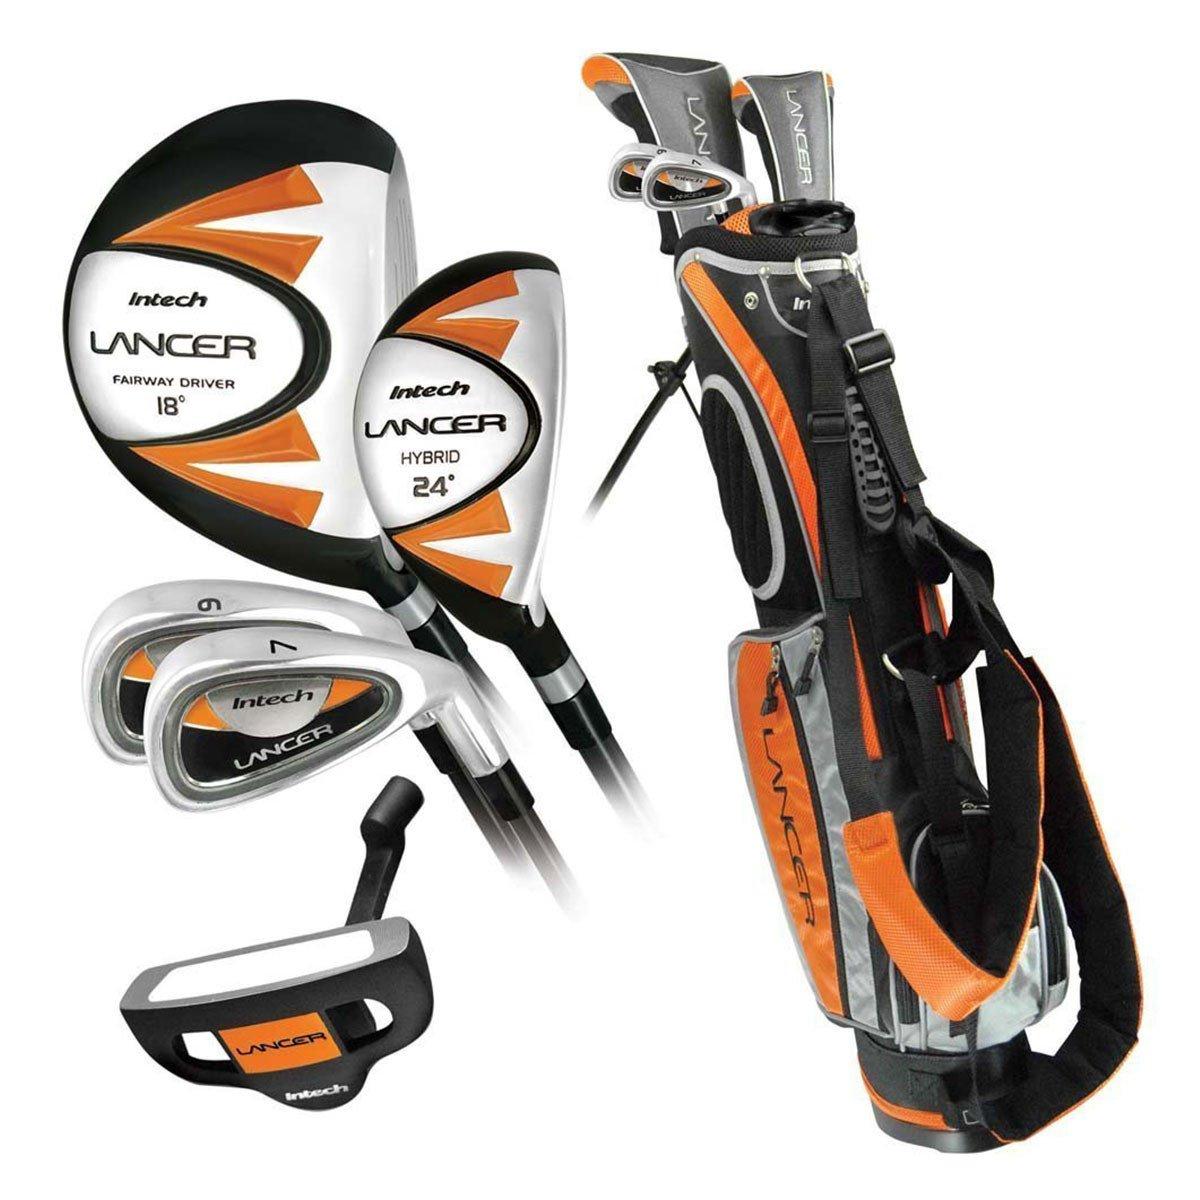 Intech Lancer Junior Golf Set Image